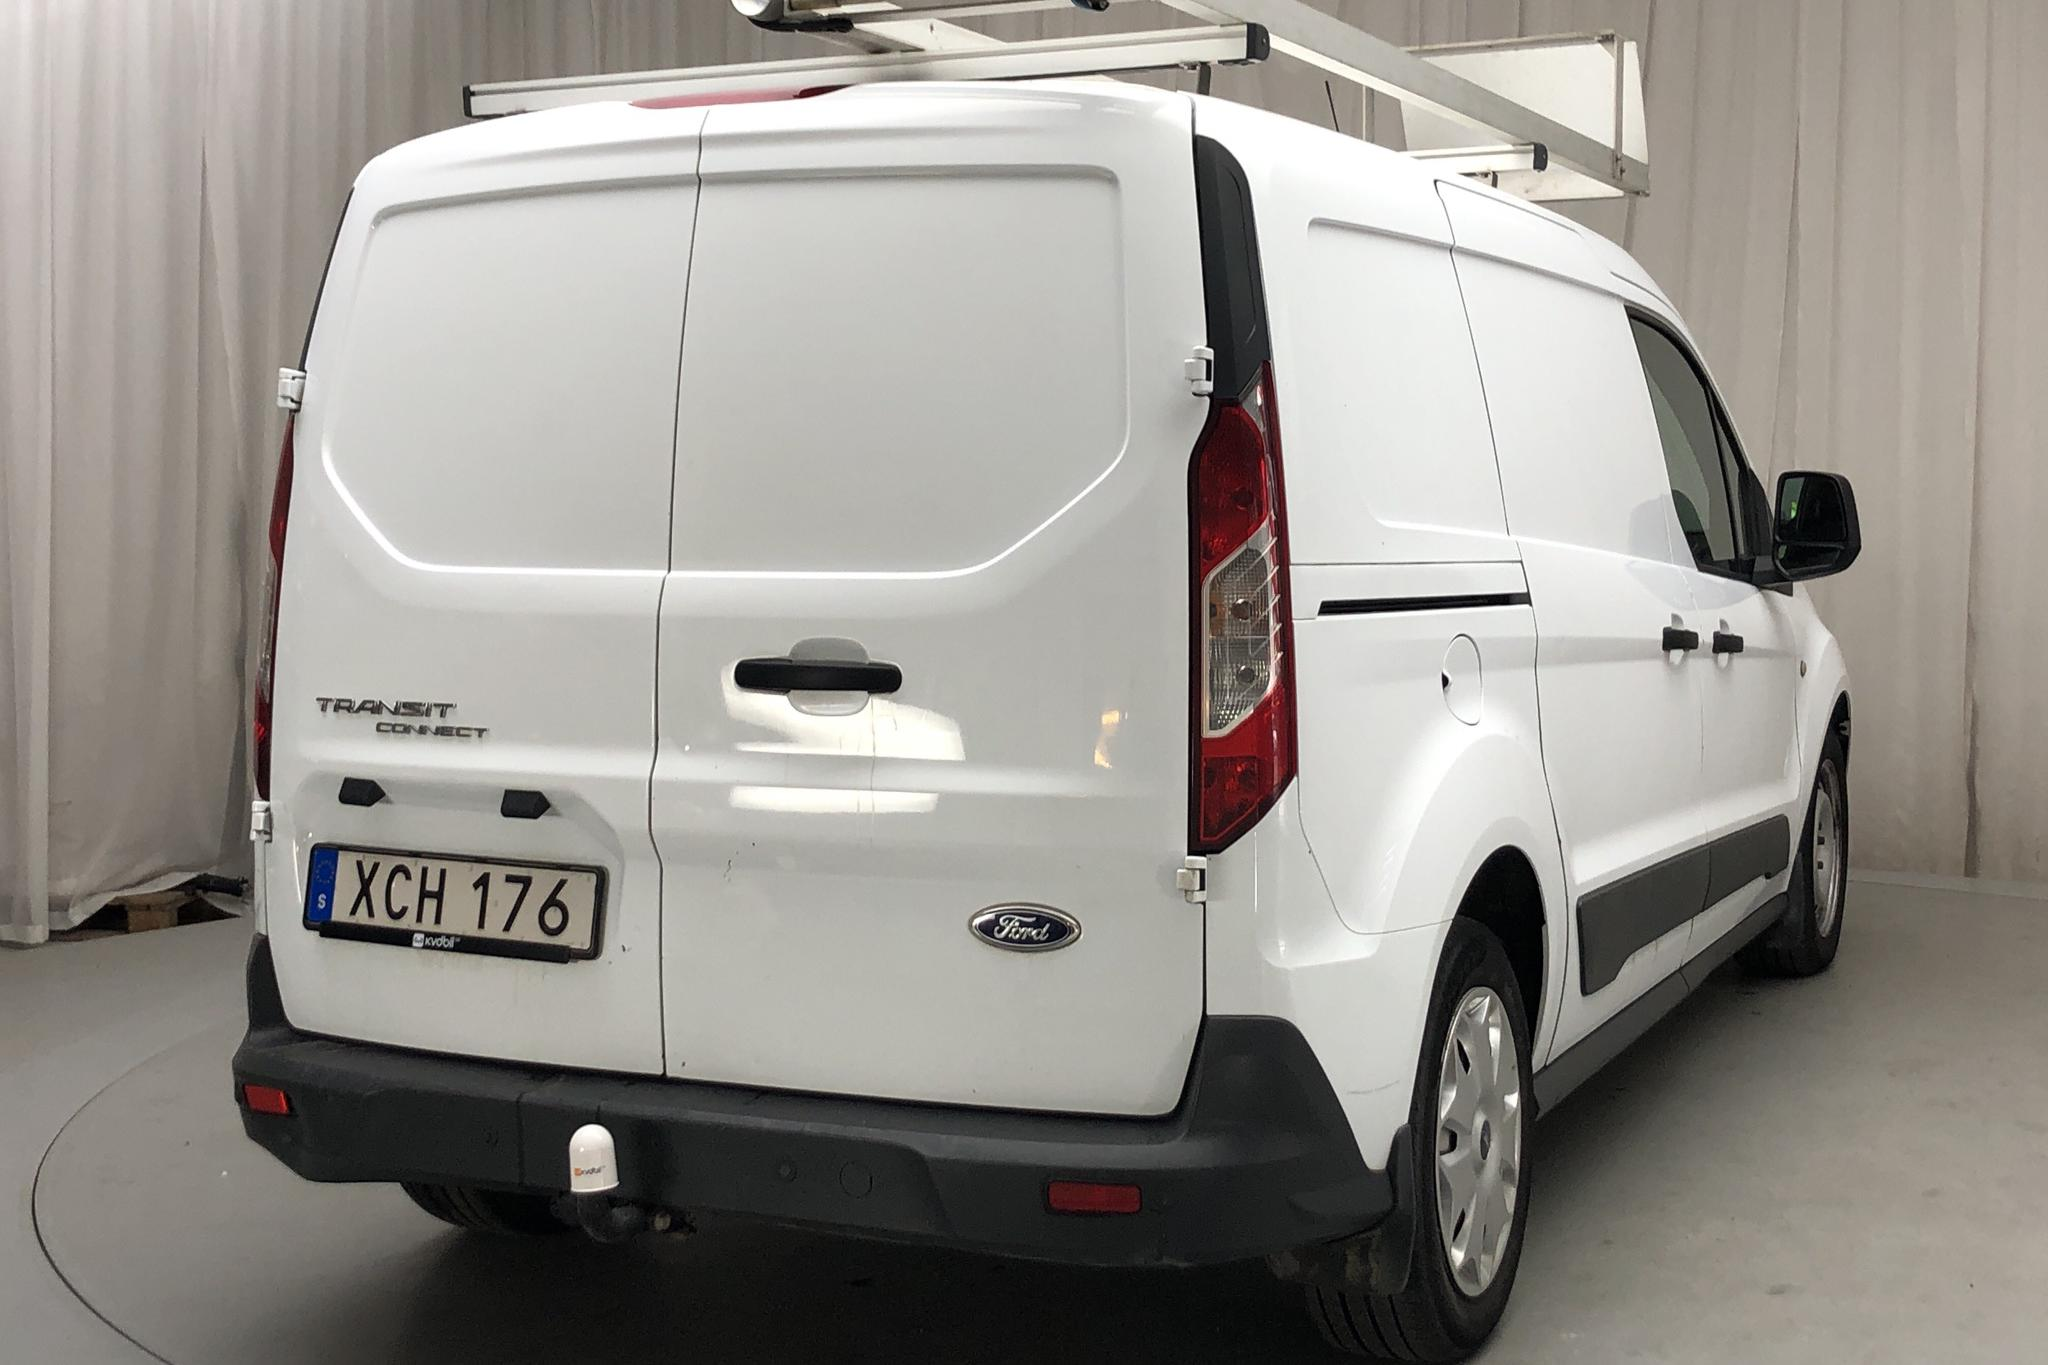 Ford Transit Connect 1.6 TDCi (95hk) - 11 076 mil - Manuell - vit - 2014